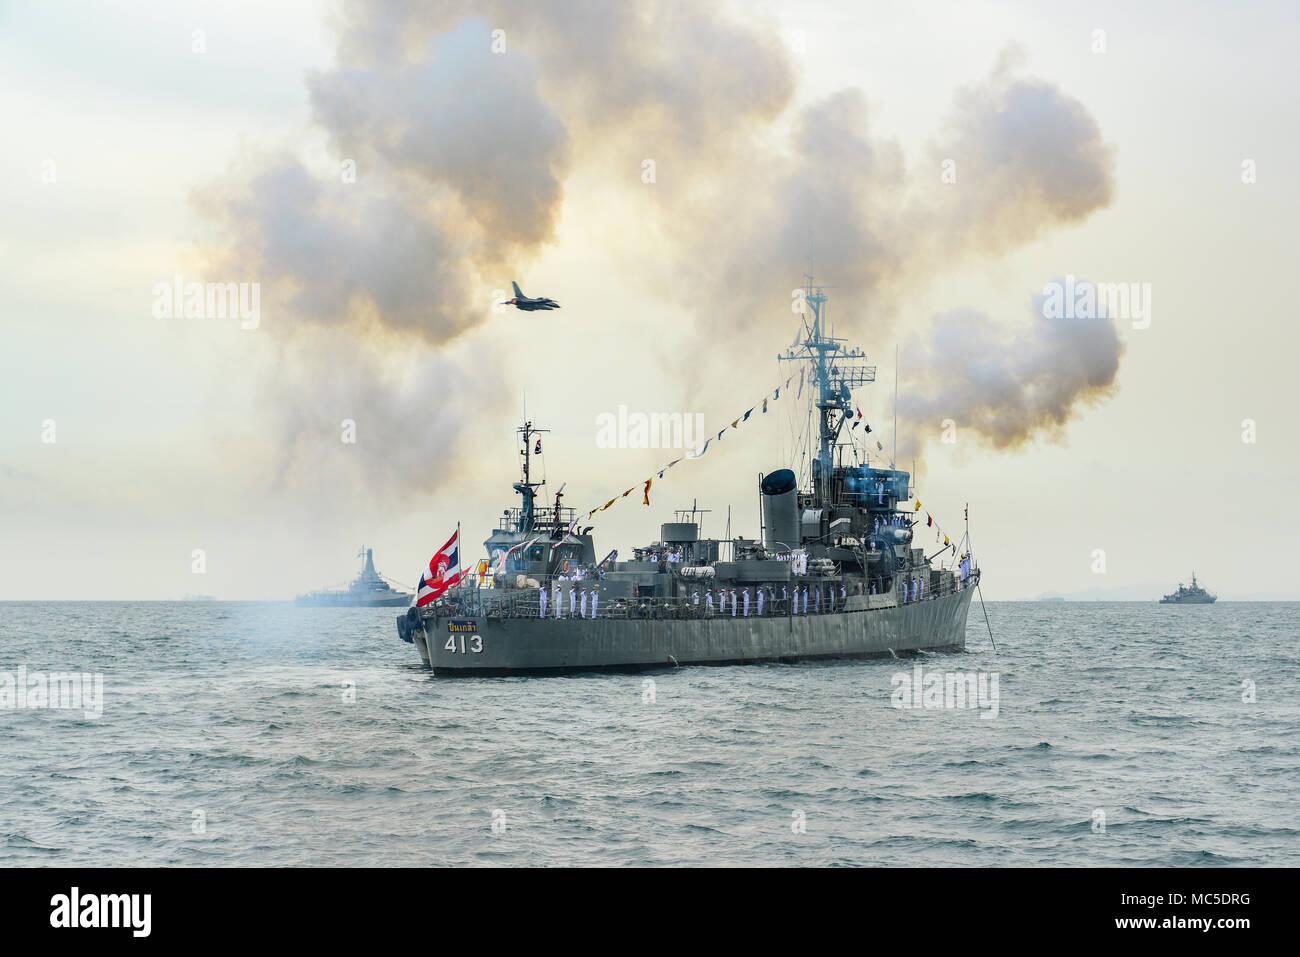 Pattaya, Thailand - November 20, 2017, Navy warship gunning salute on sea whle warplane above the ship on the 50th anniversary ASEAN international fle - Stock Image